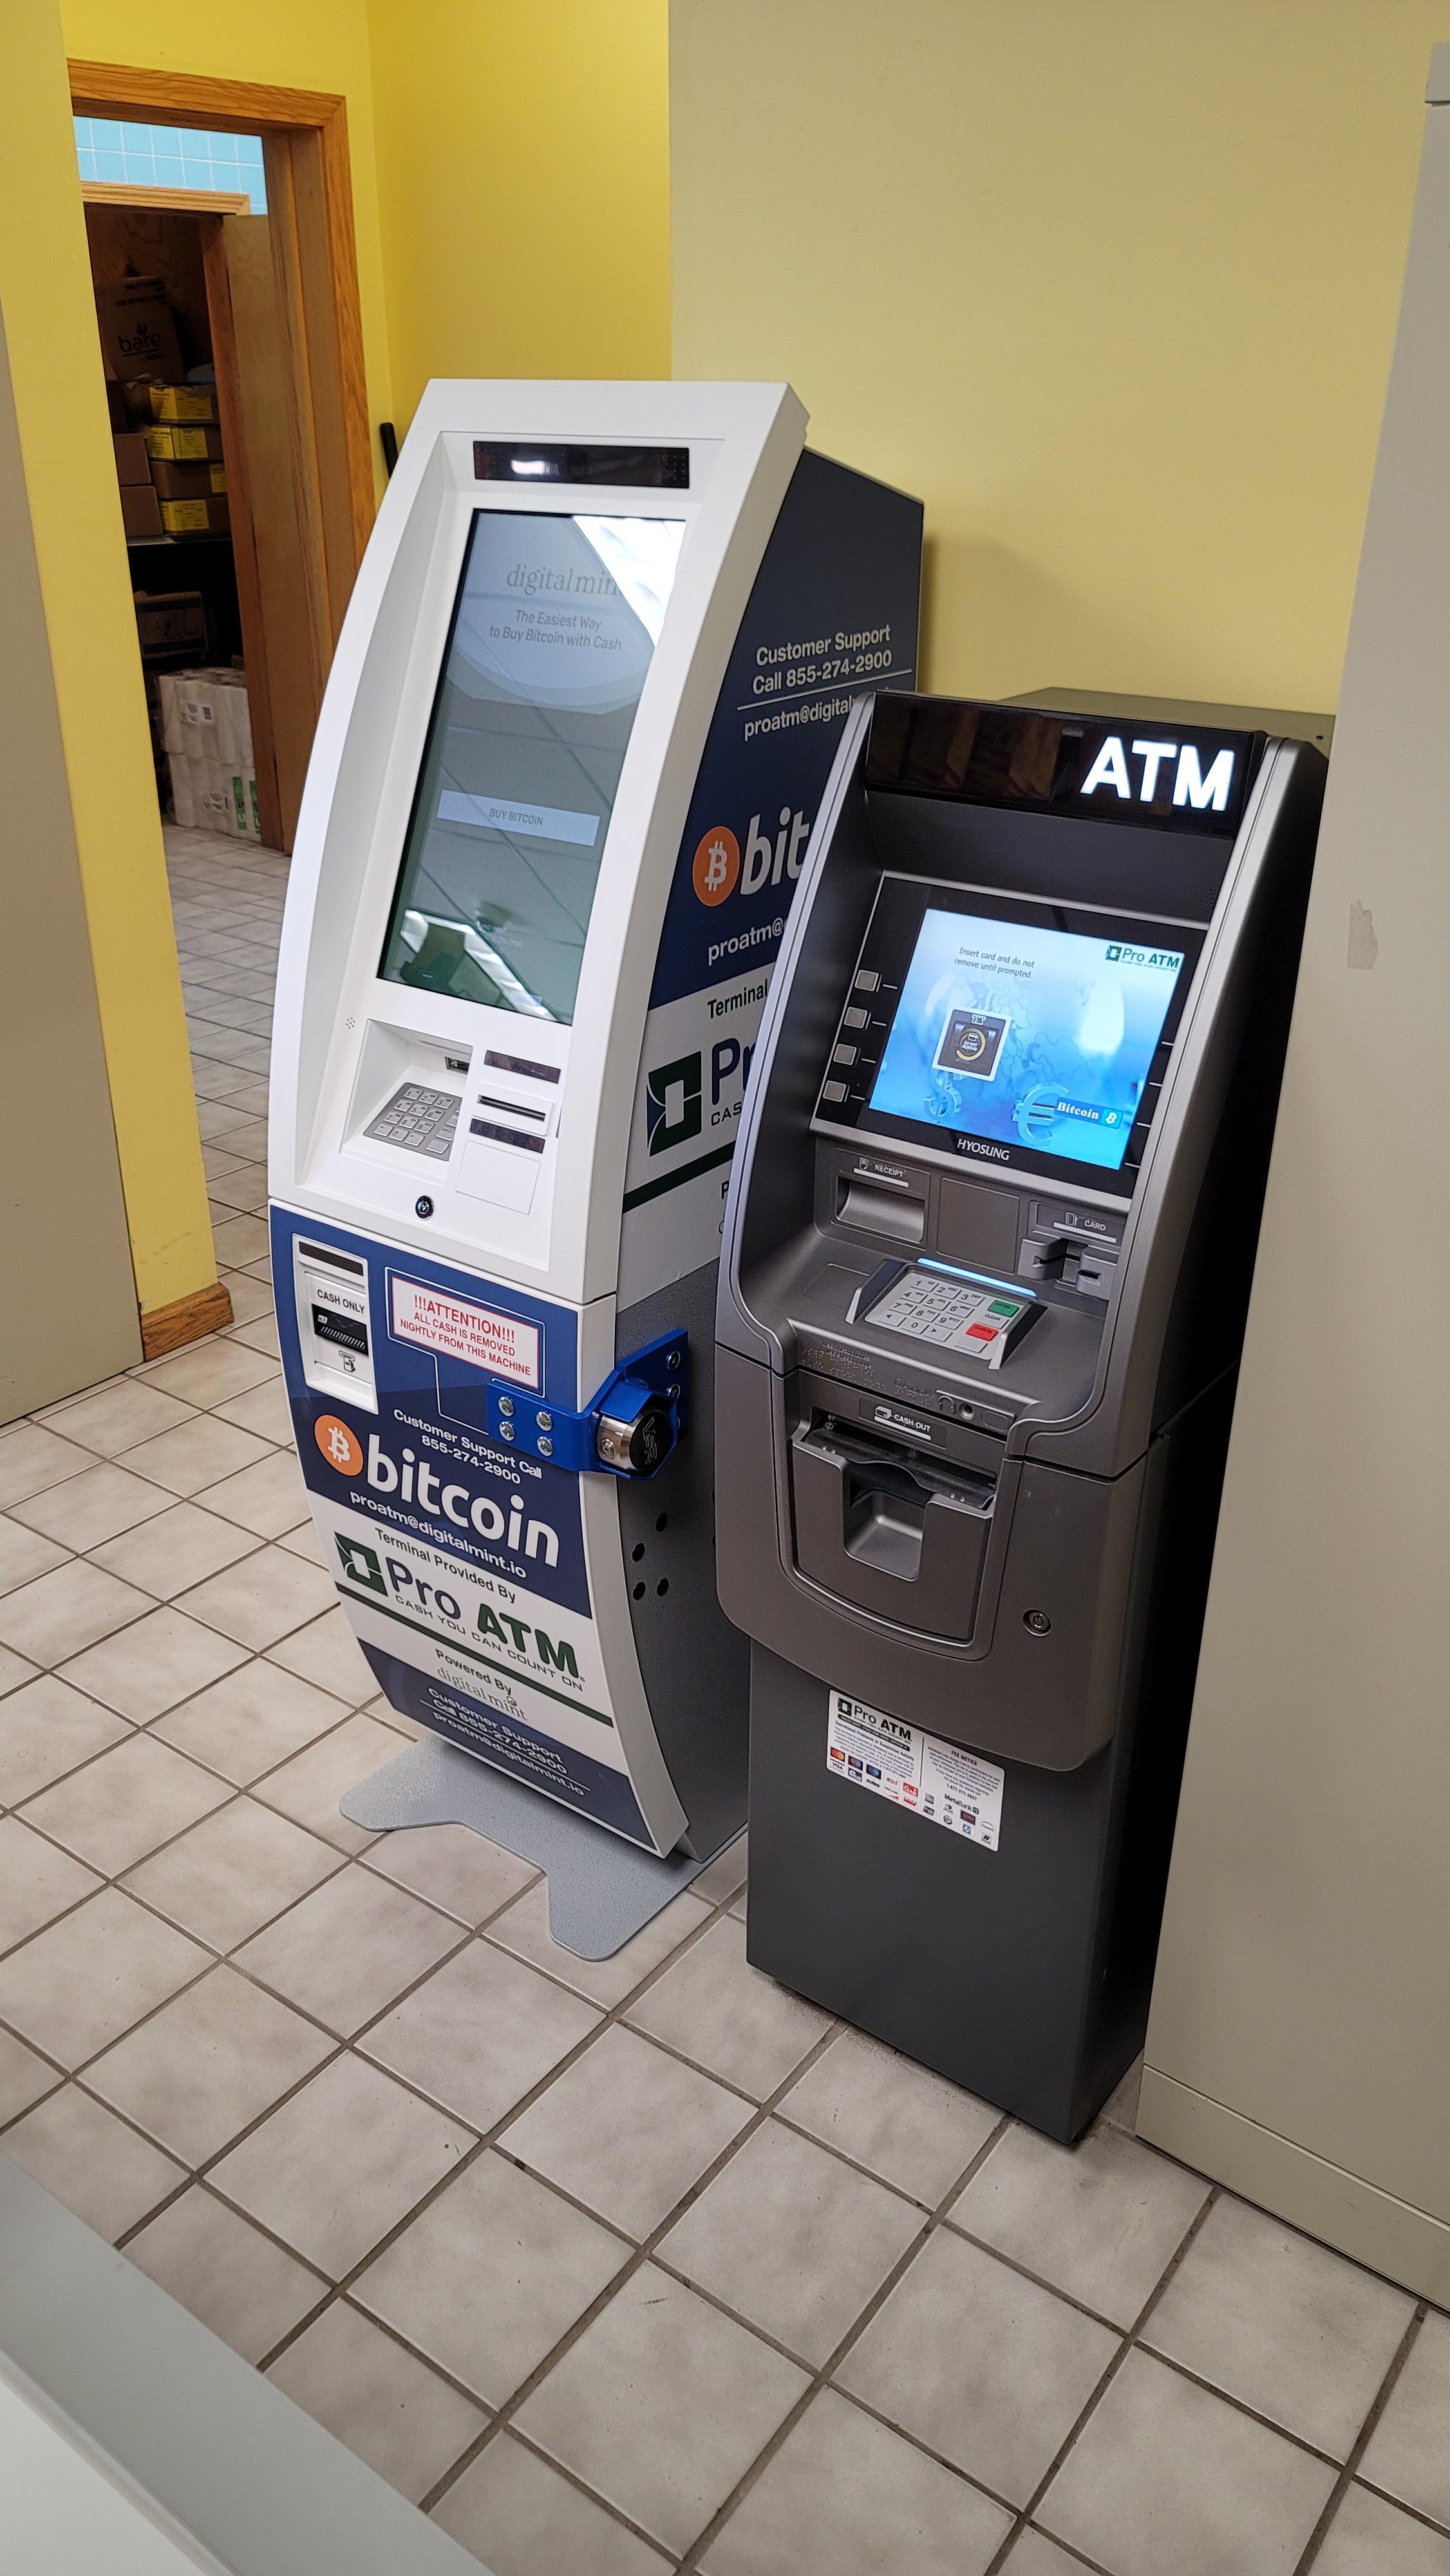 DigitalMint Bitcoin ATM